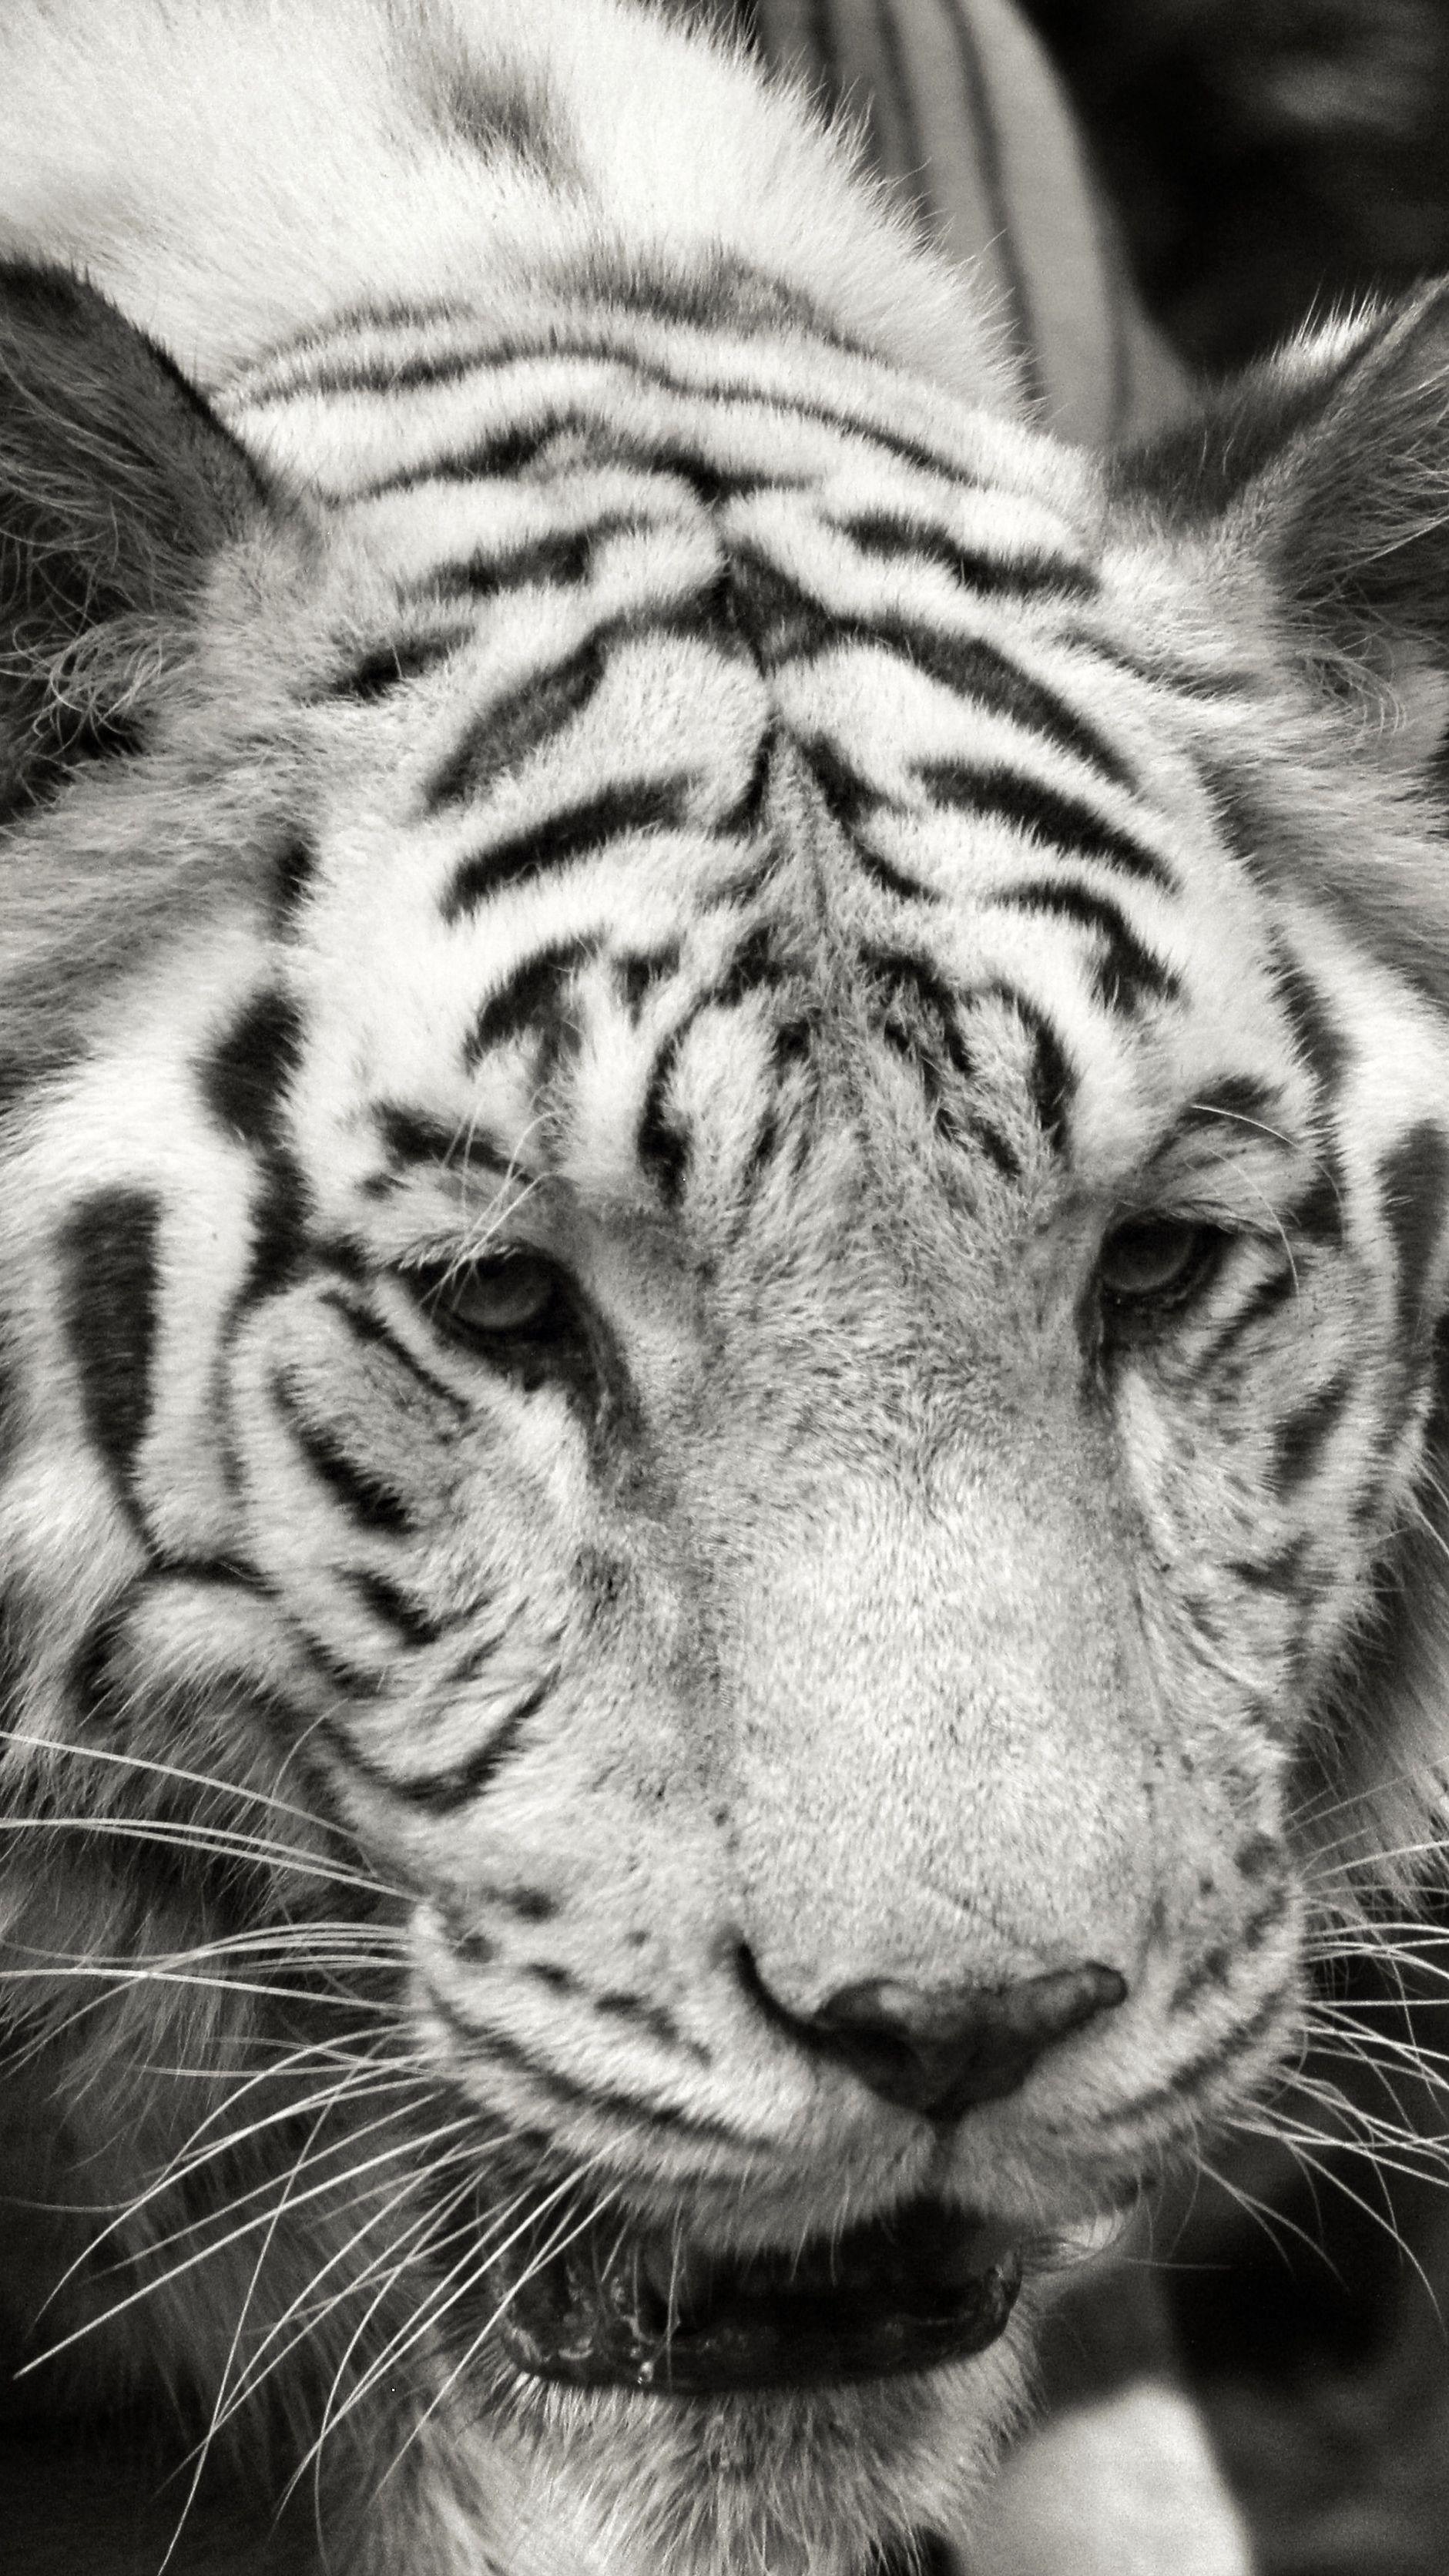 Alert, white tiger